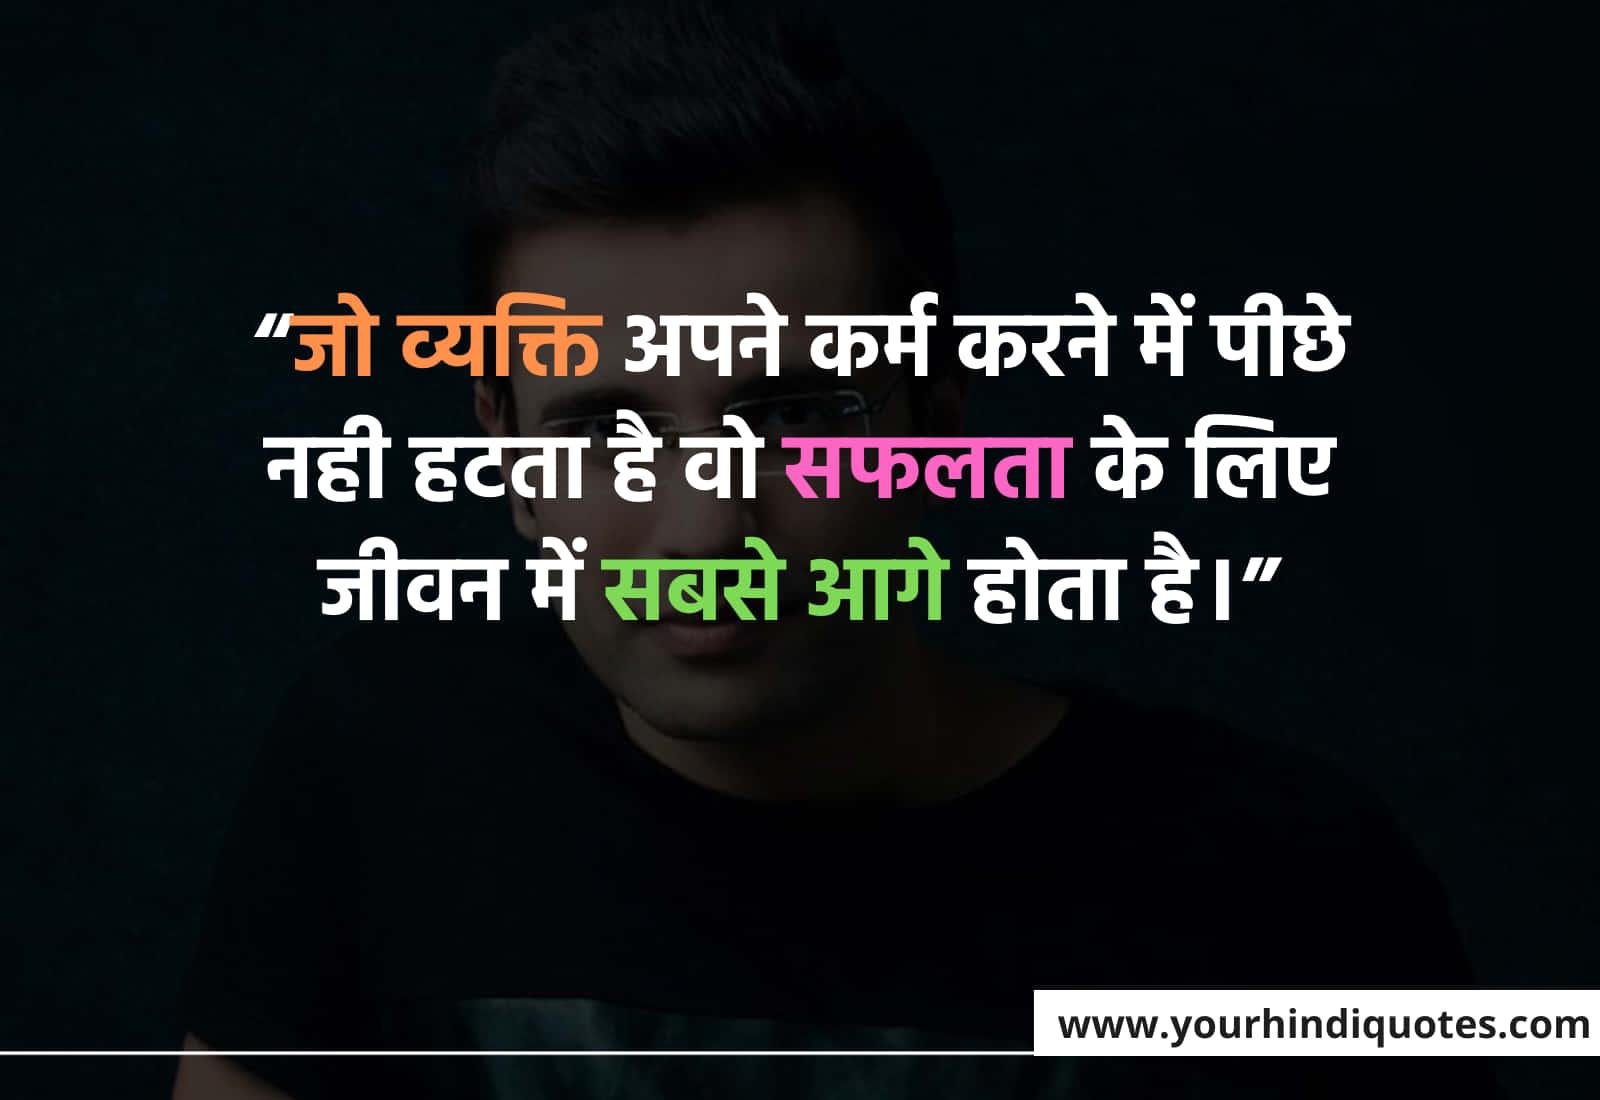 Bhagwat Gita Quotes for Goal In Hindi